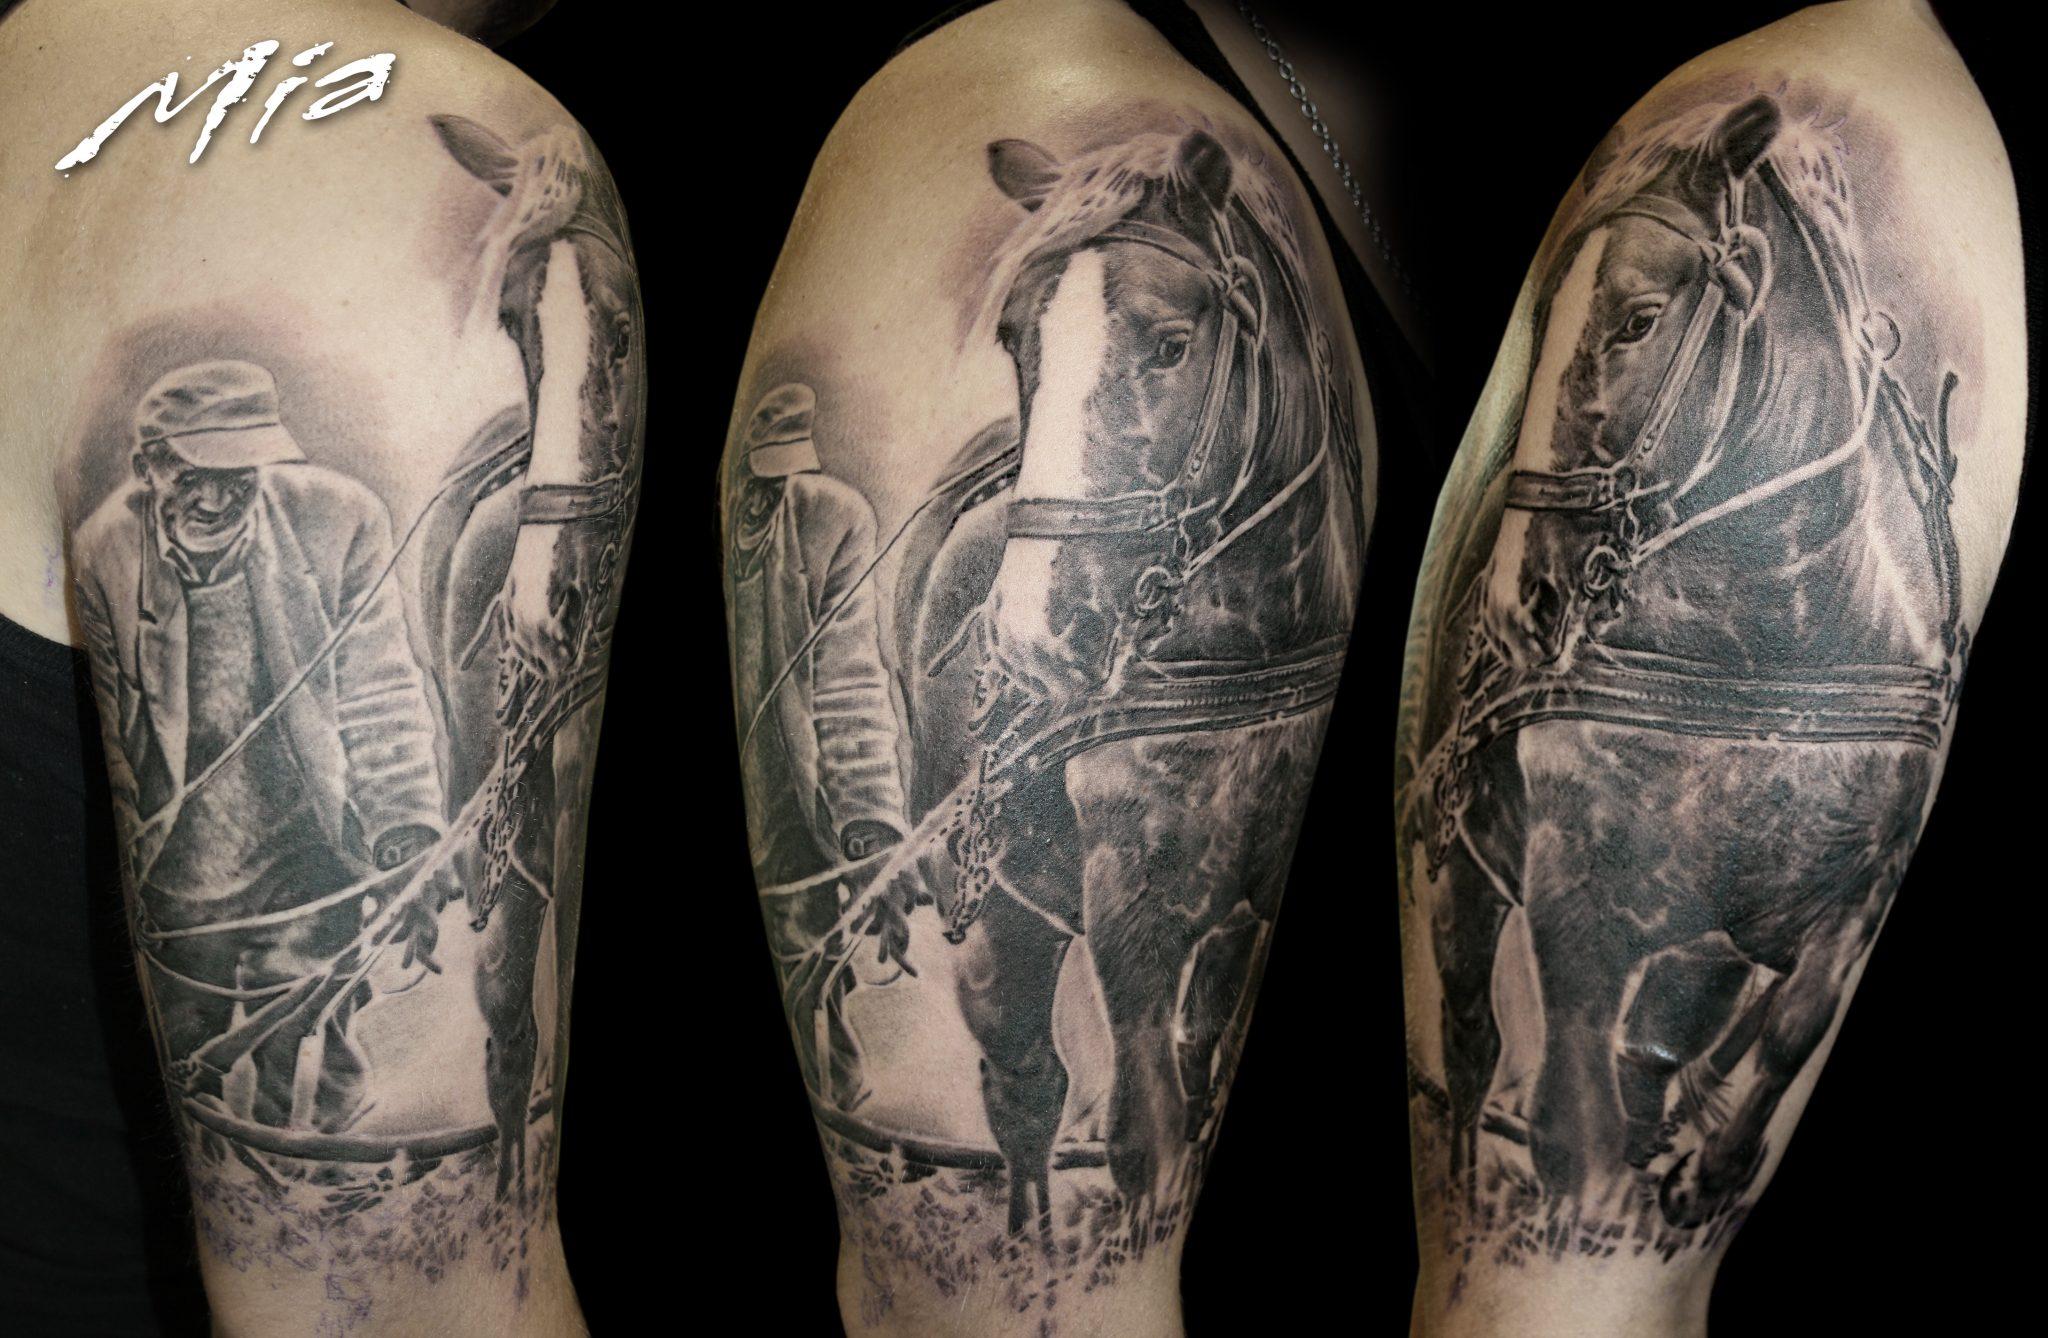 Mia Reloaded Tattoo Trier